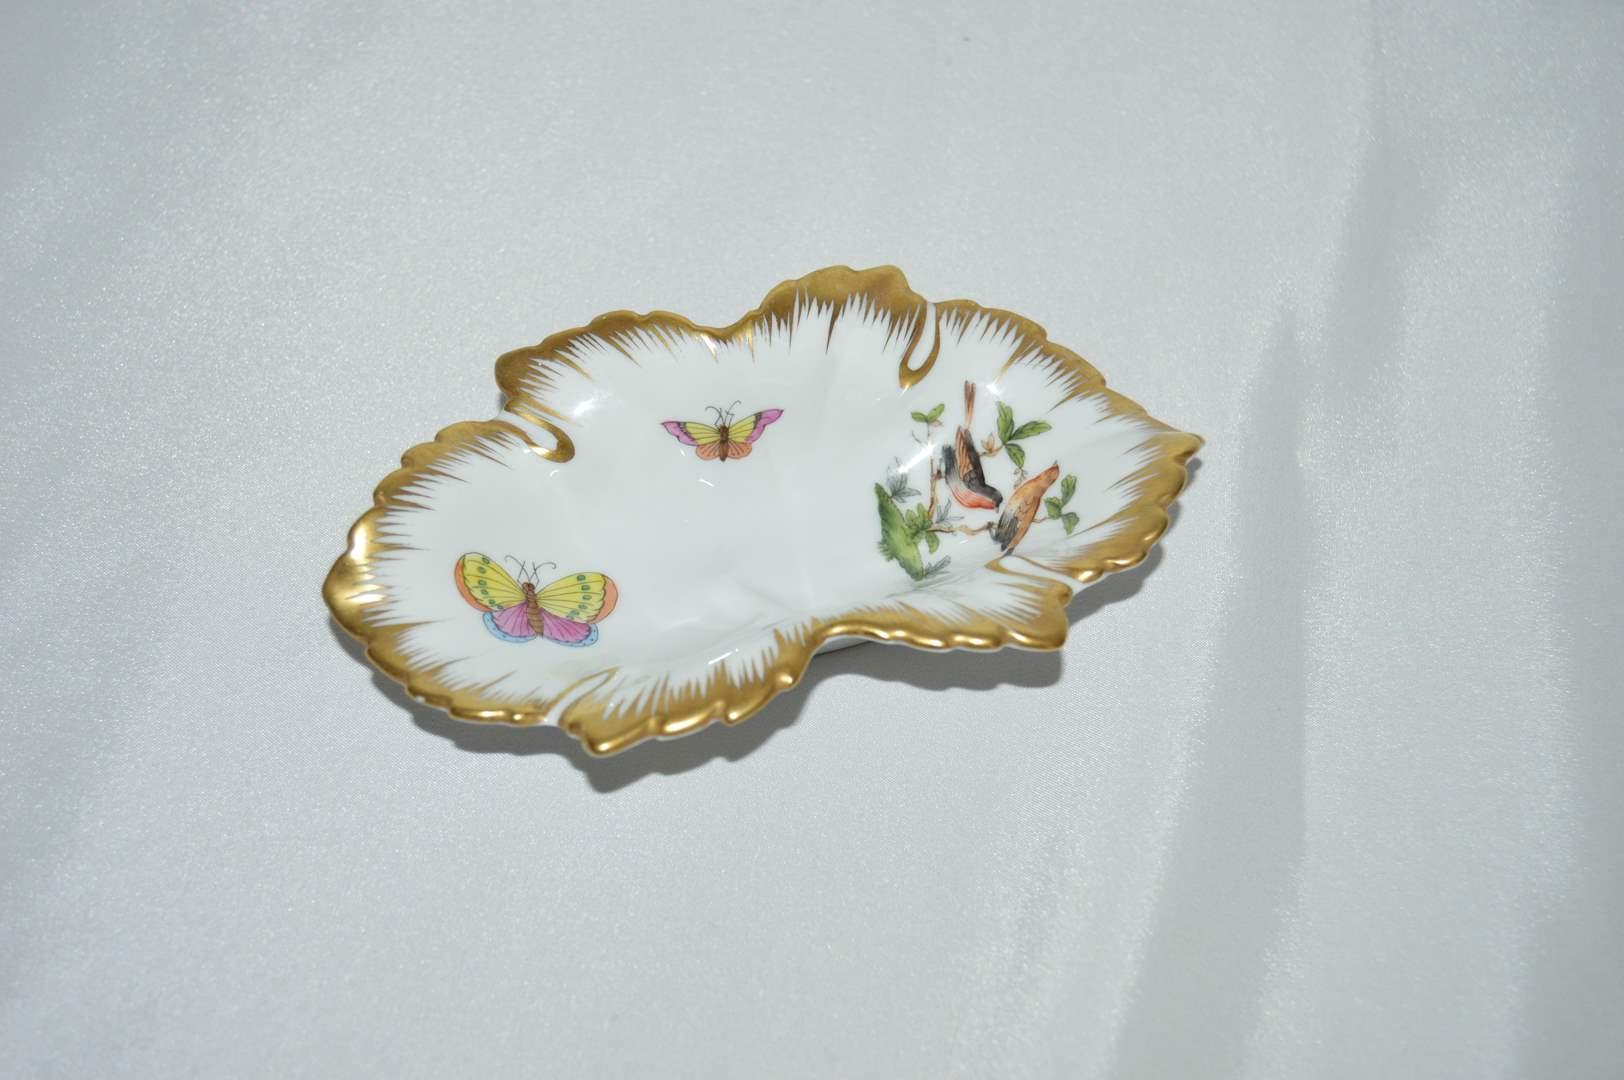 Lot # 69 Herend Rothschild leaf trinket dish with gold trim (main image)